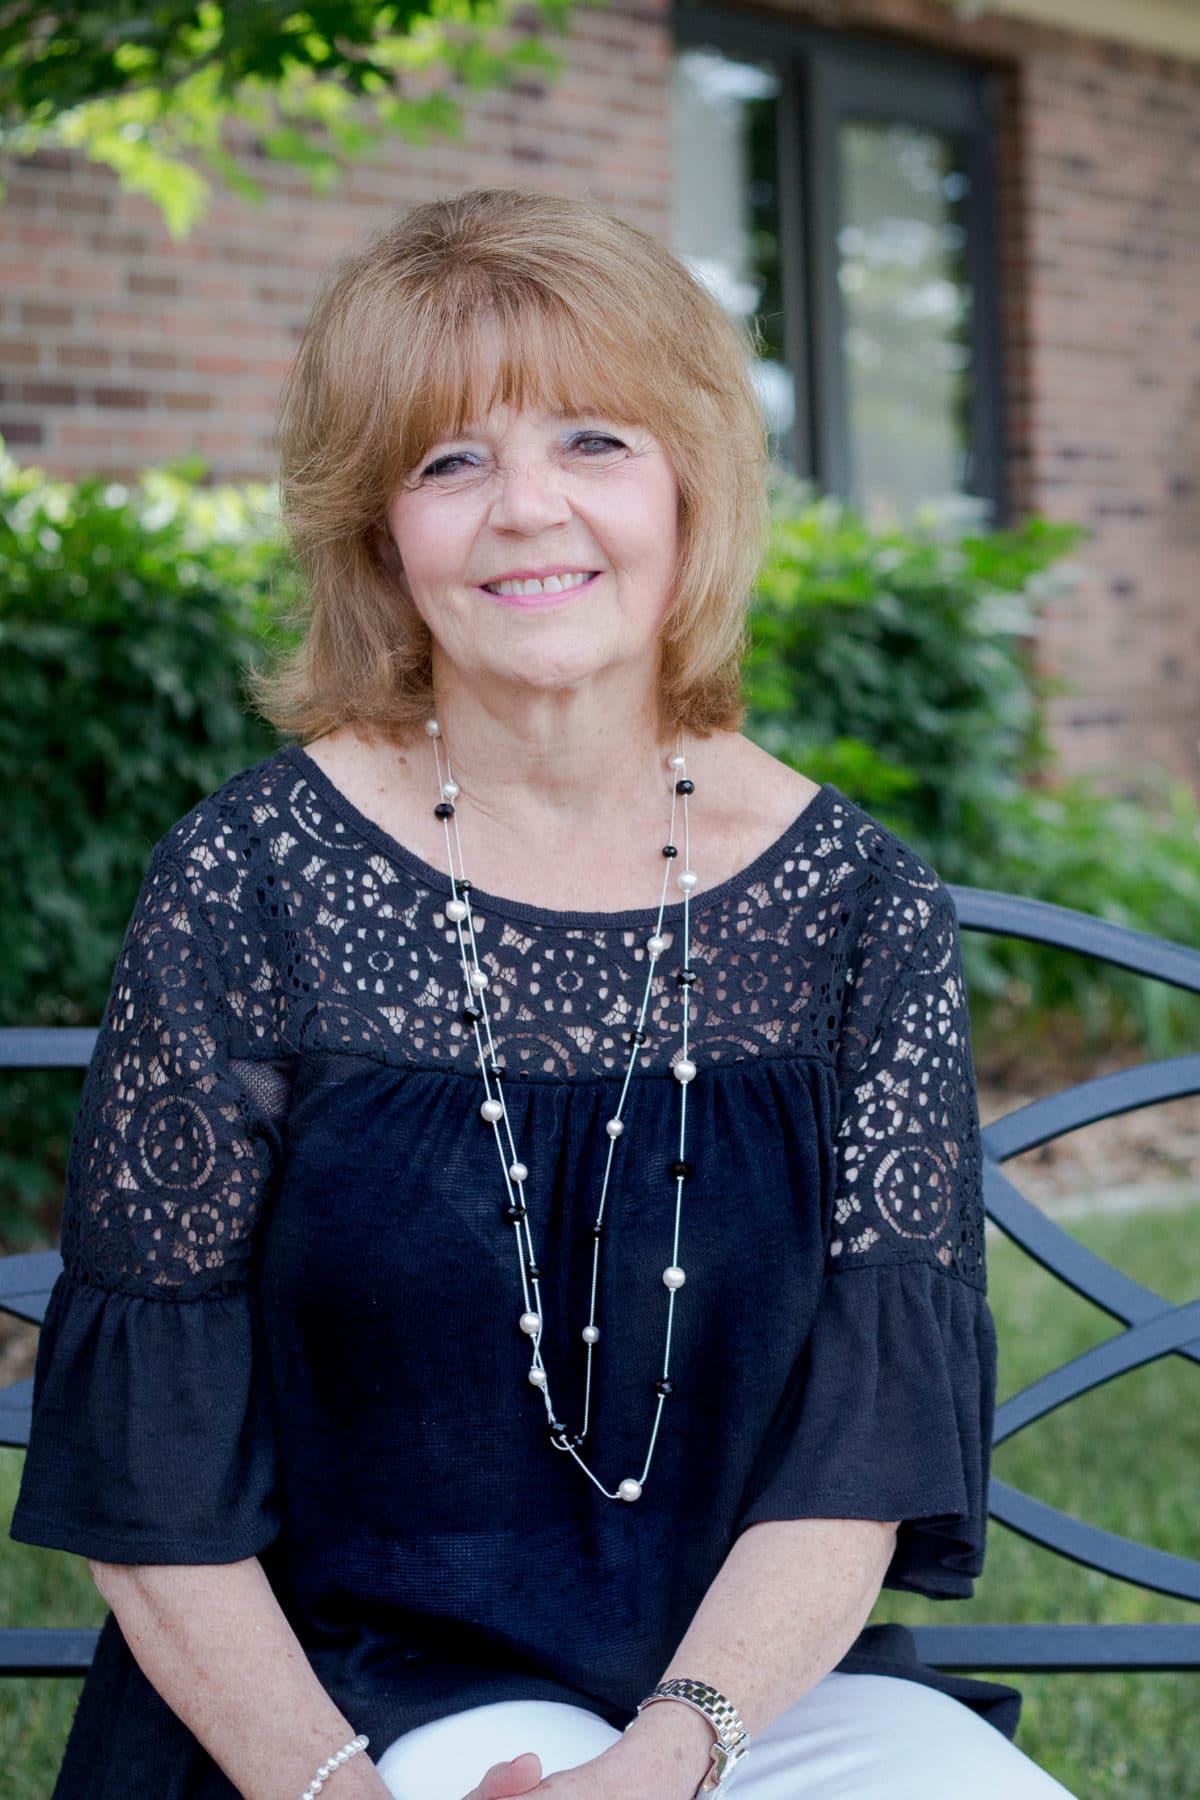 Diane Himmelsbaugh-Nursery Manager